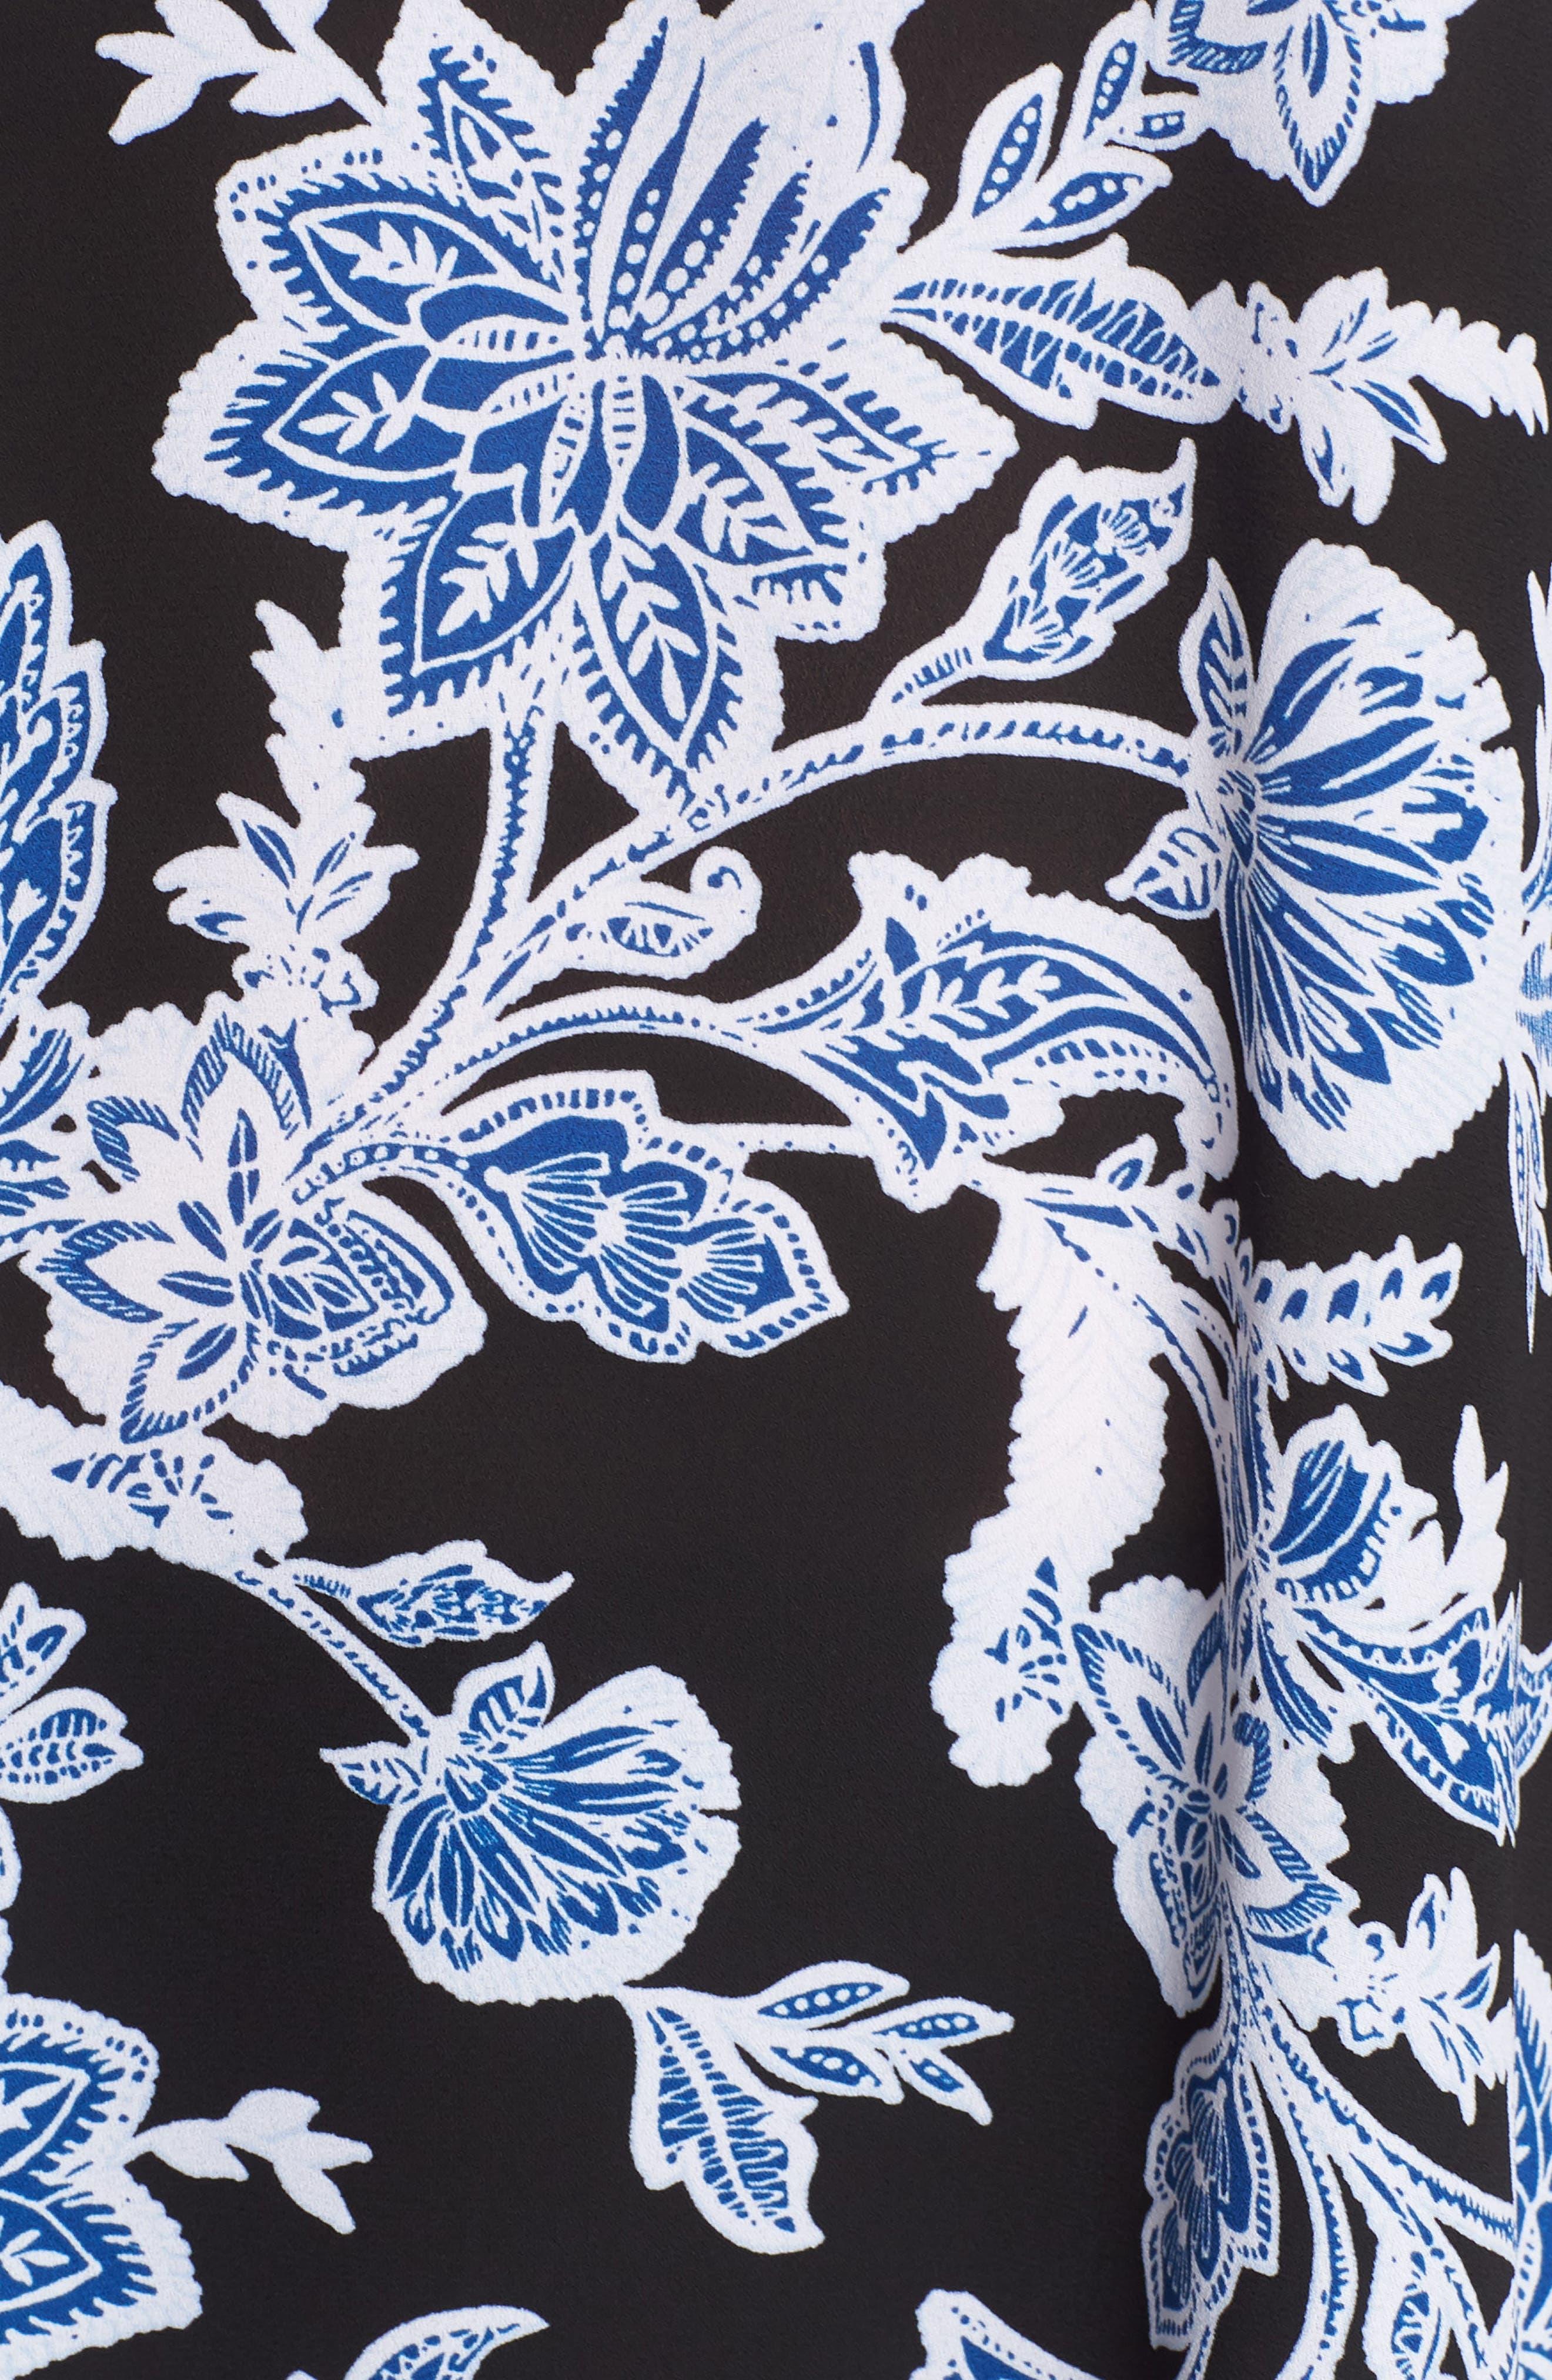 Floral Pleat Back High/Low Top,                             Alternate thumbnail 6, color,                             010